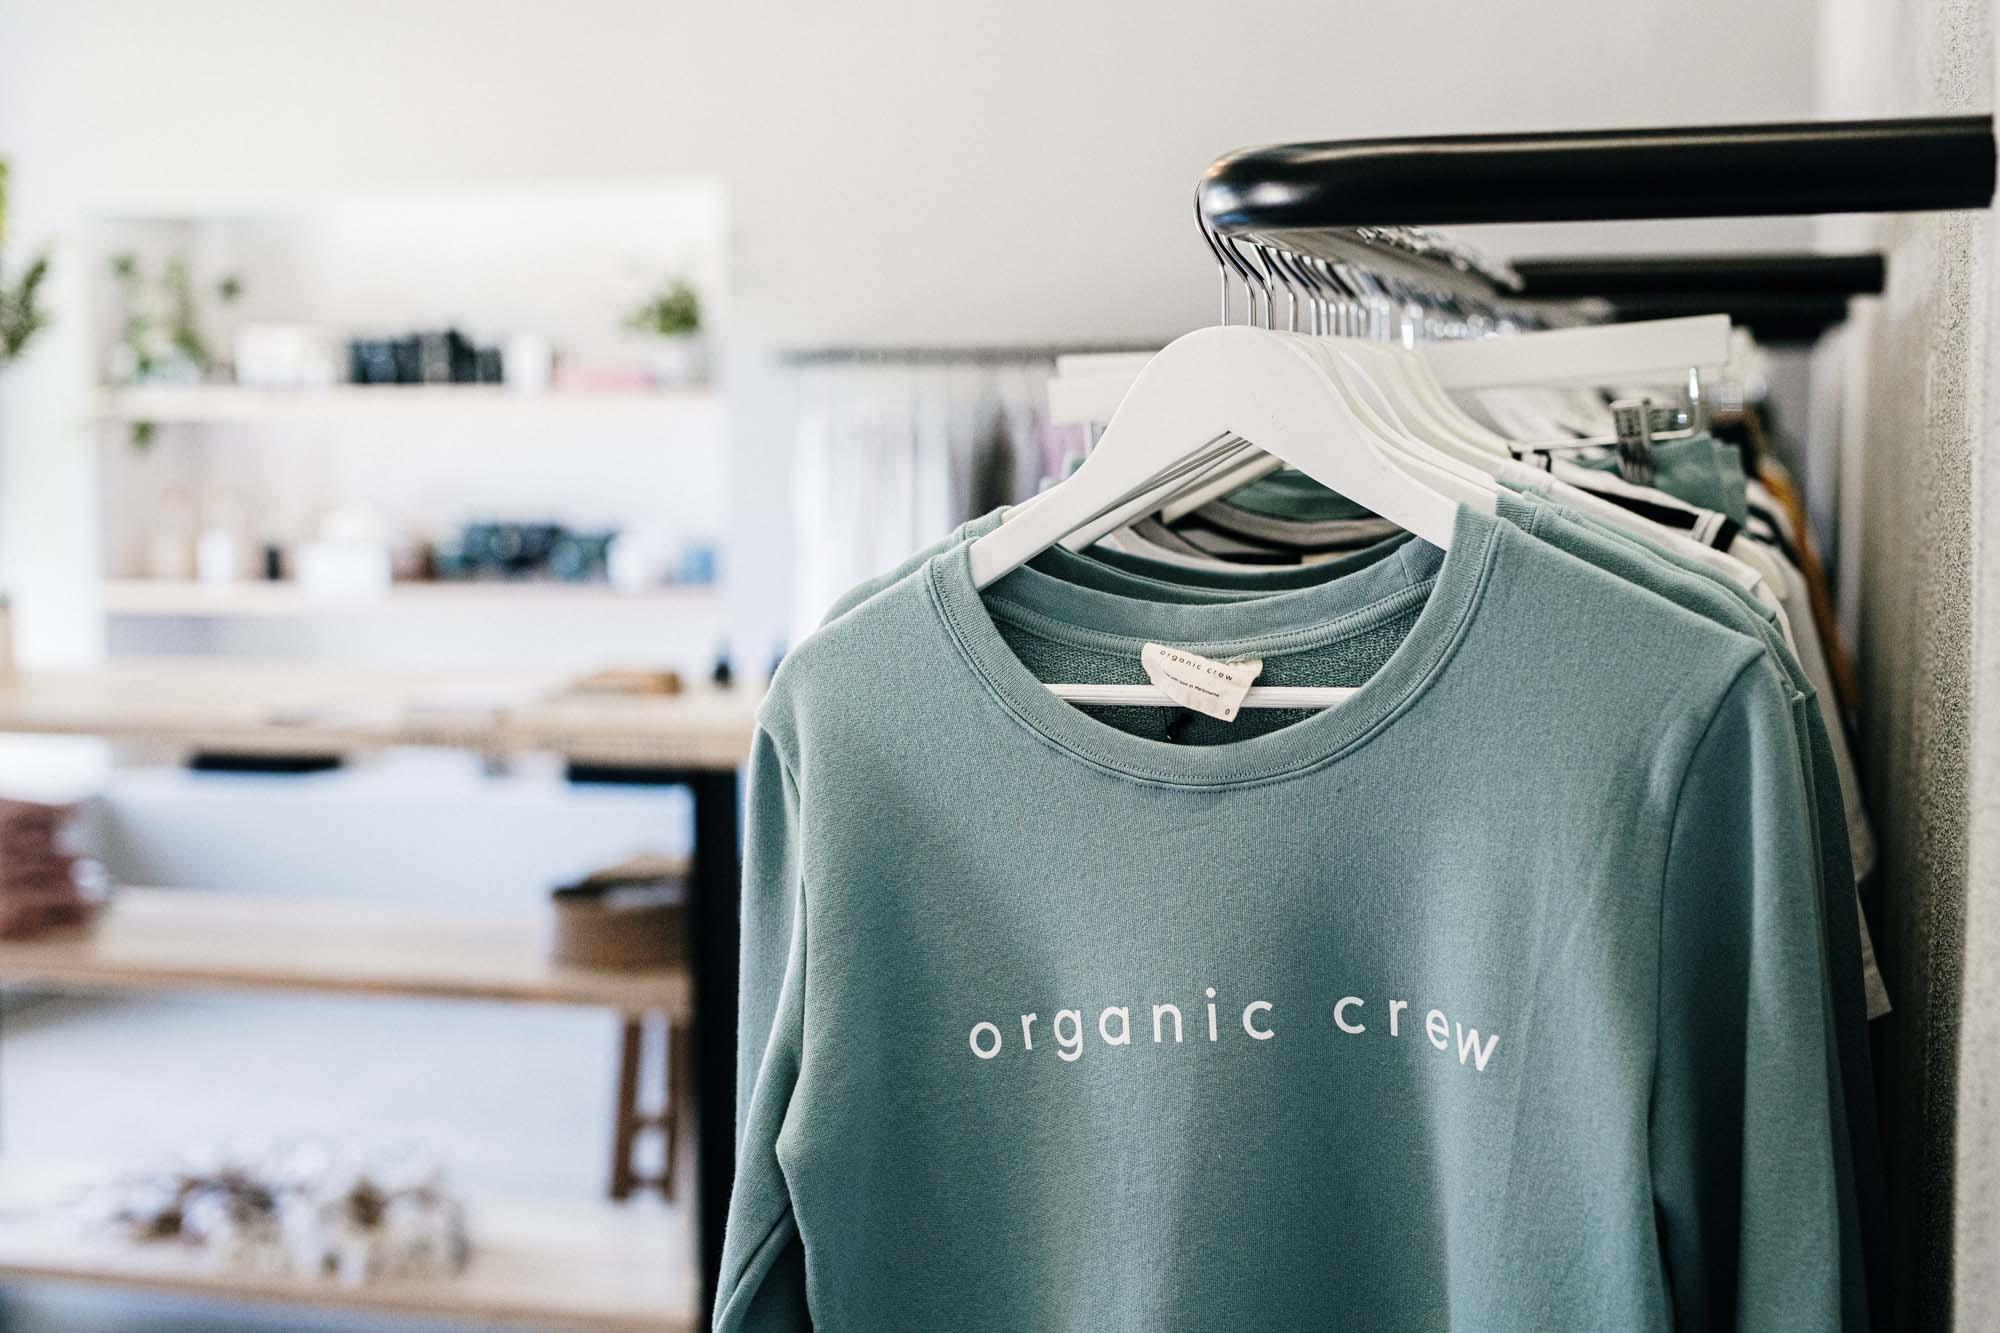 Organic Crew